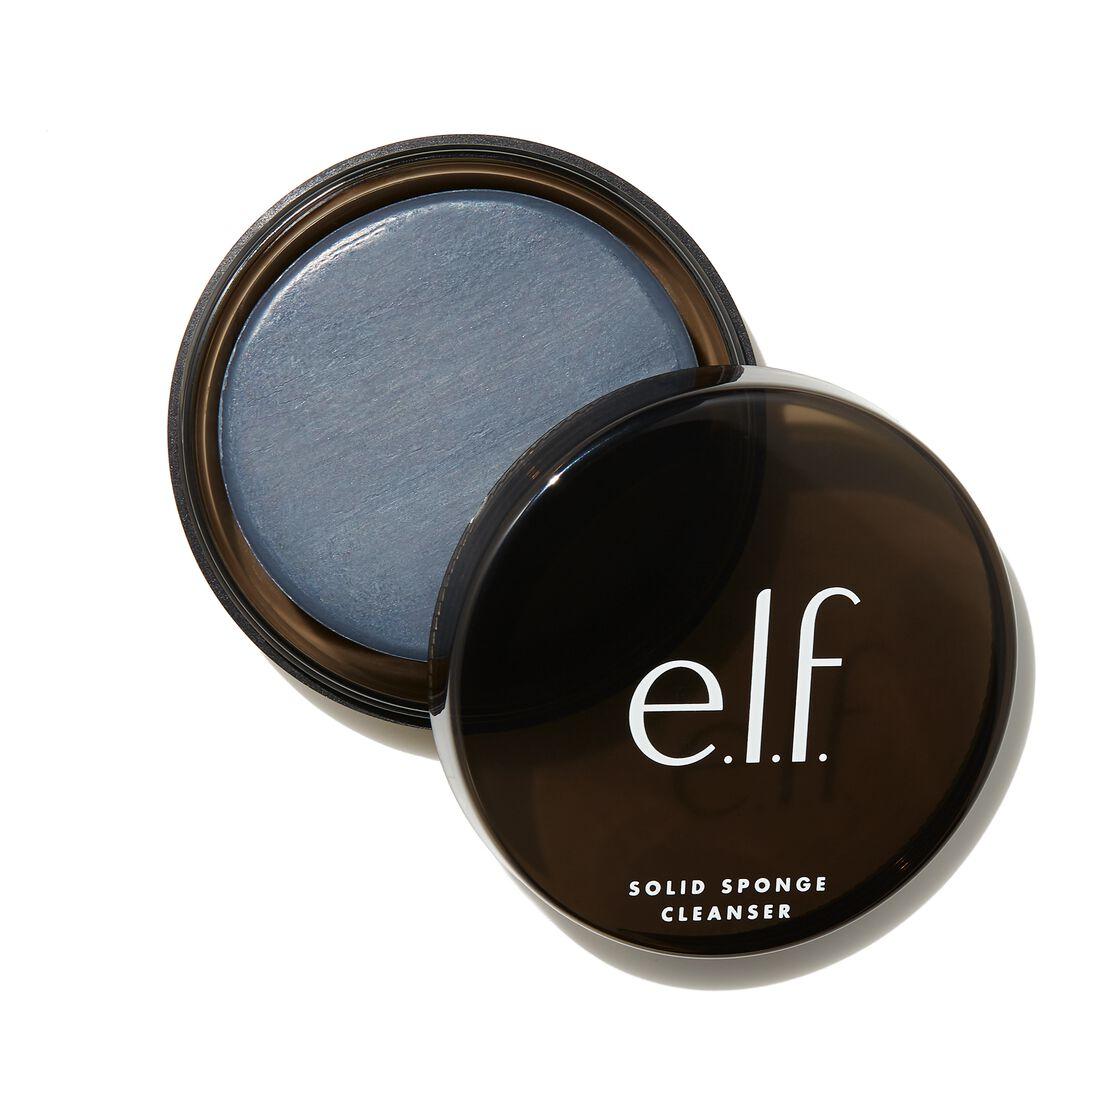 E.l.f Cosmetics - Solid Brush & Sponge Cleanser